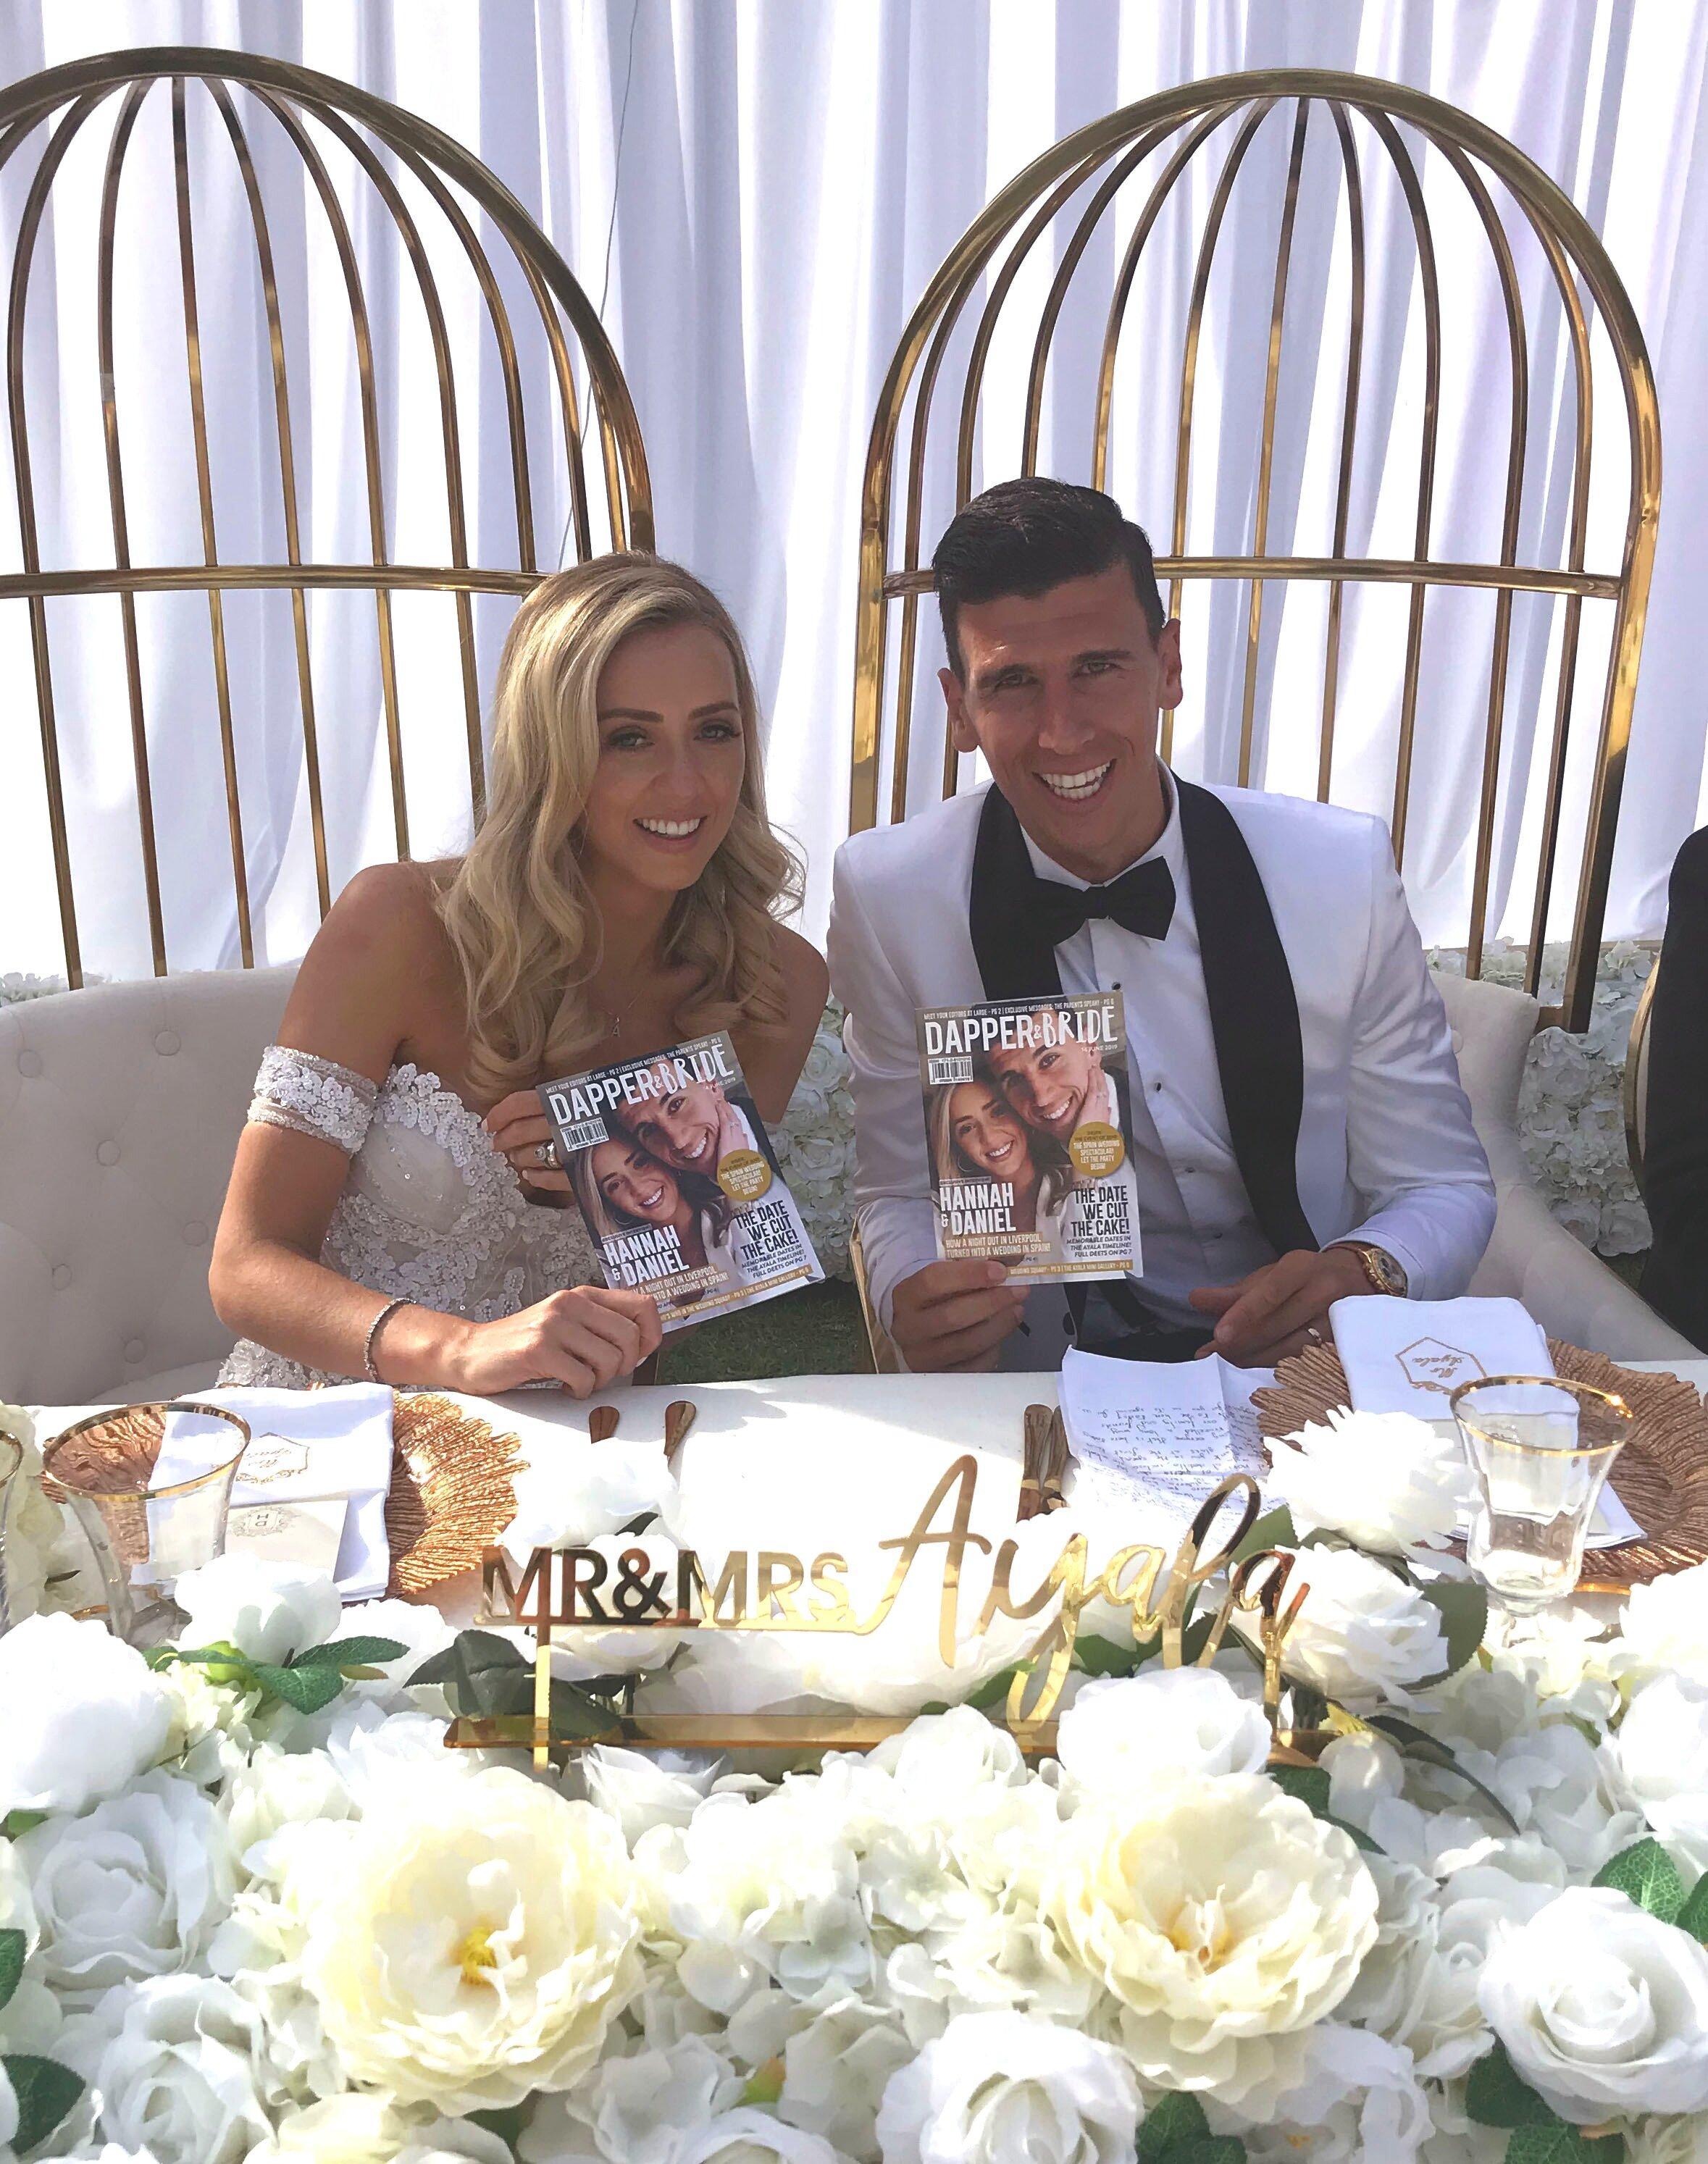 Hannah and Daniel Dapper & Bride Personalised Wedding Magazine shot.jpg